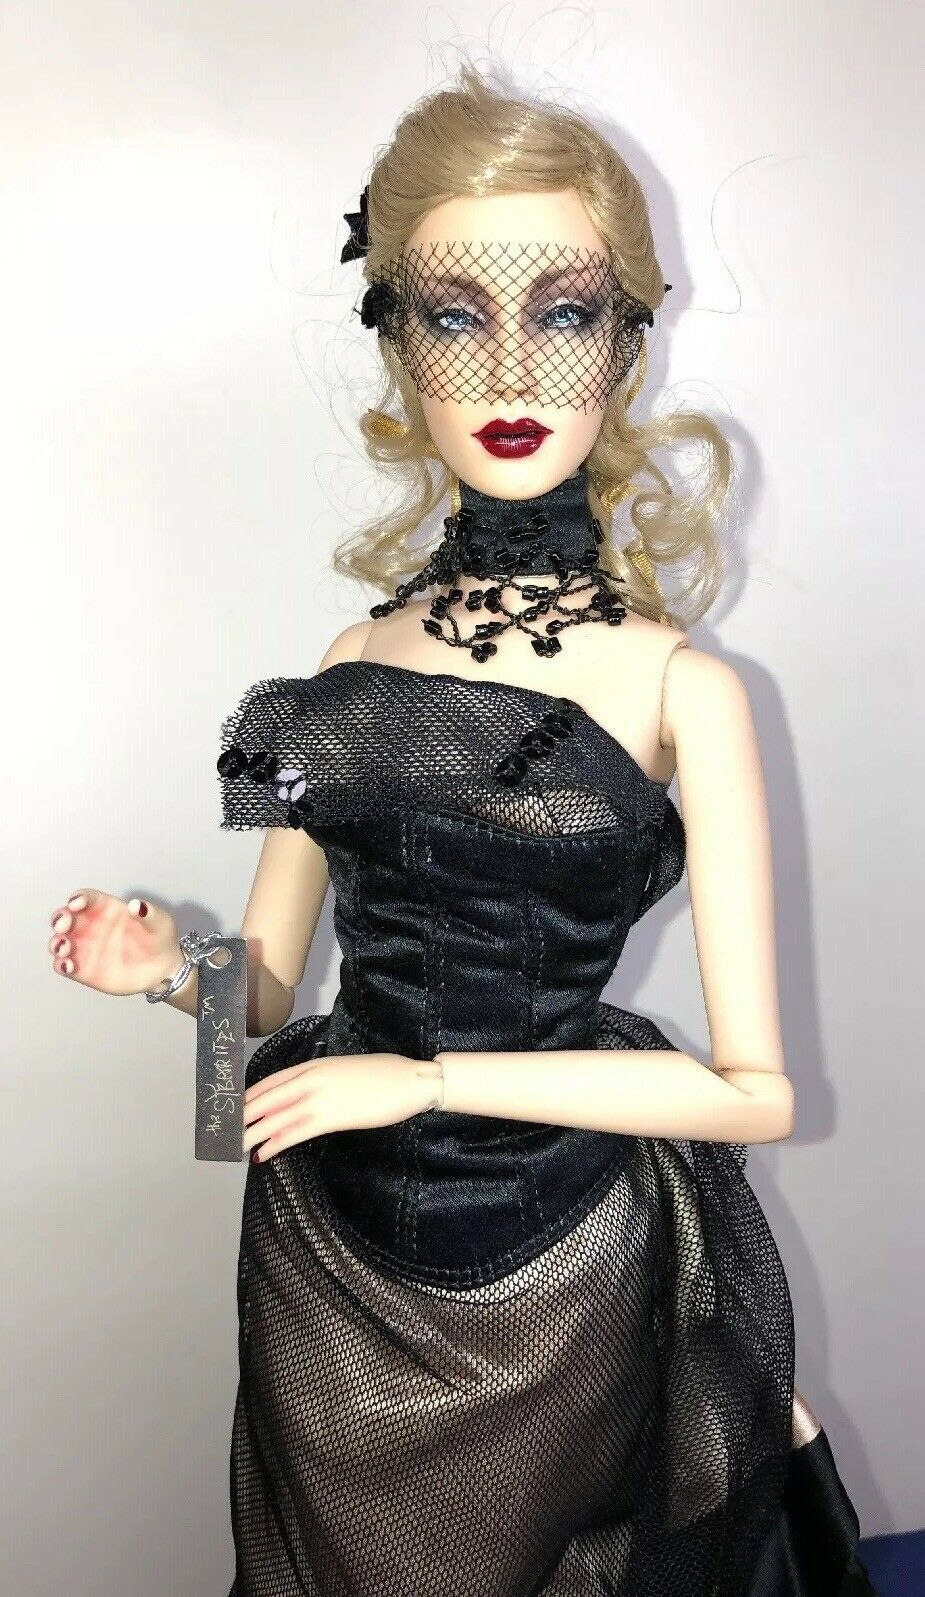 16.5  MUÑECAS SIBARITAS limitada BJD superdoll Alta Costura Salon BJD Resina